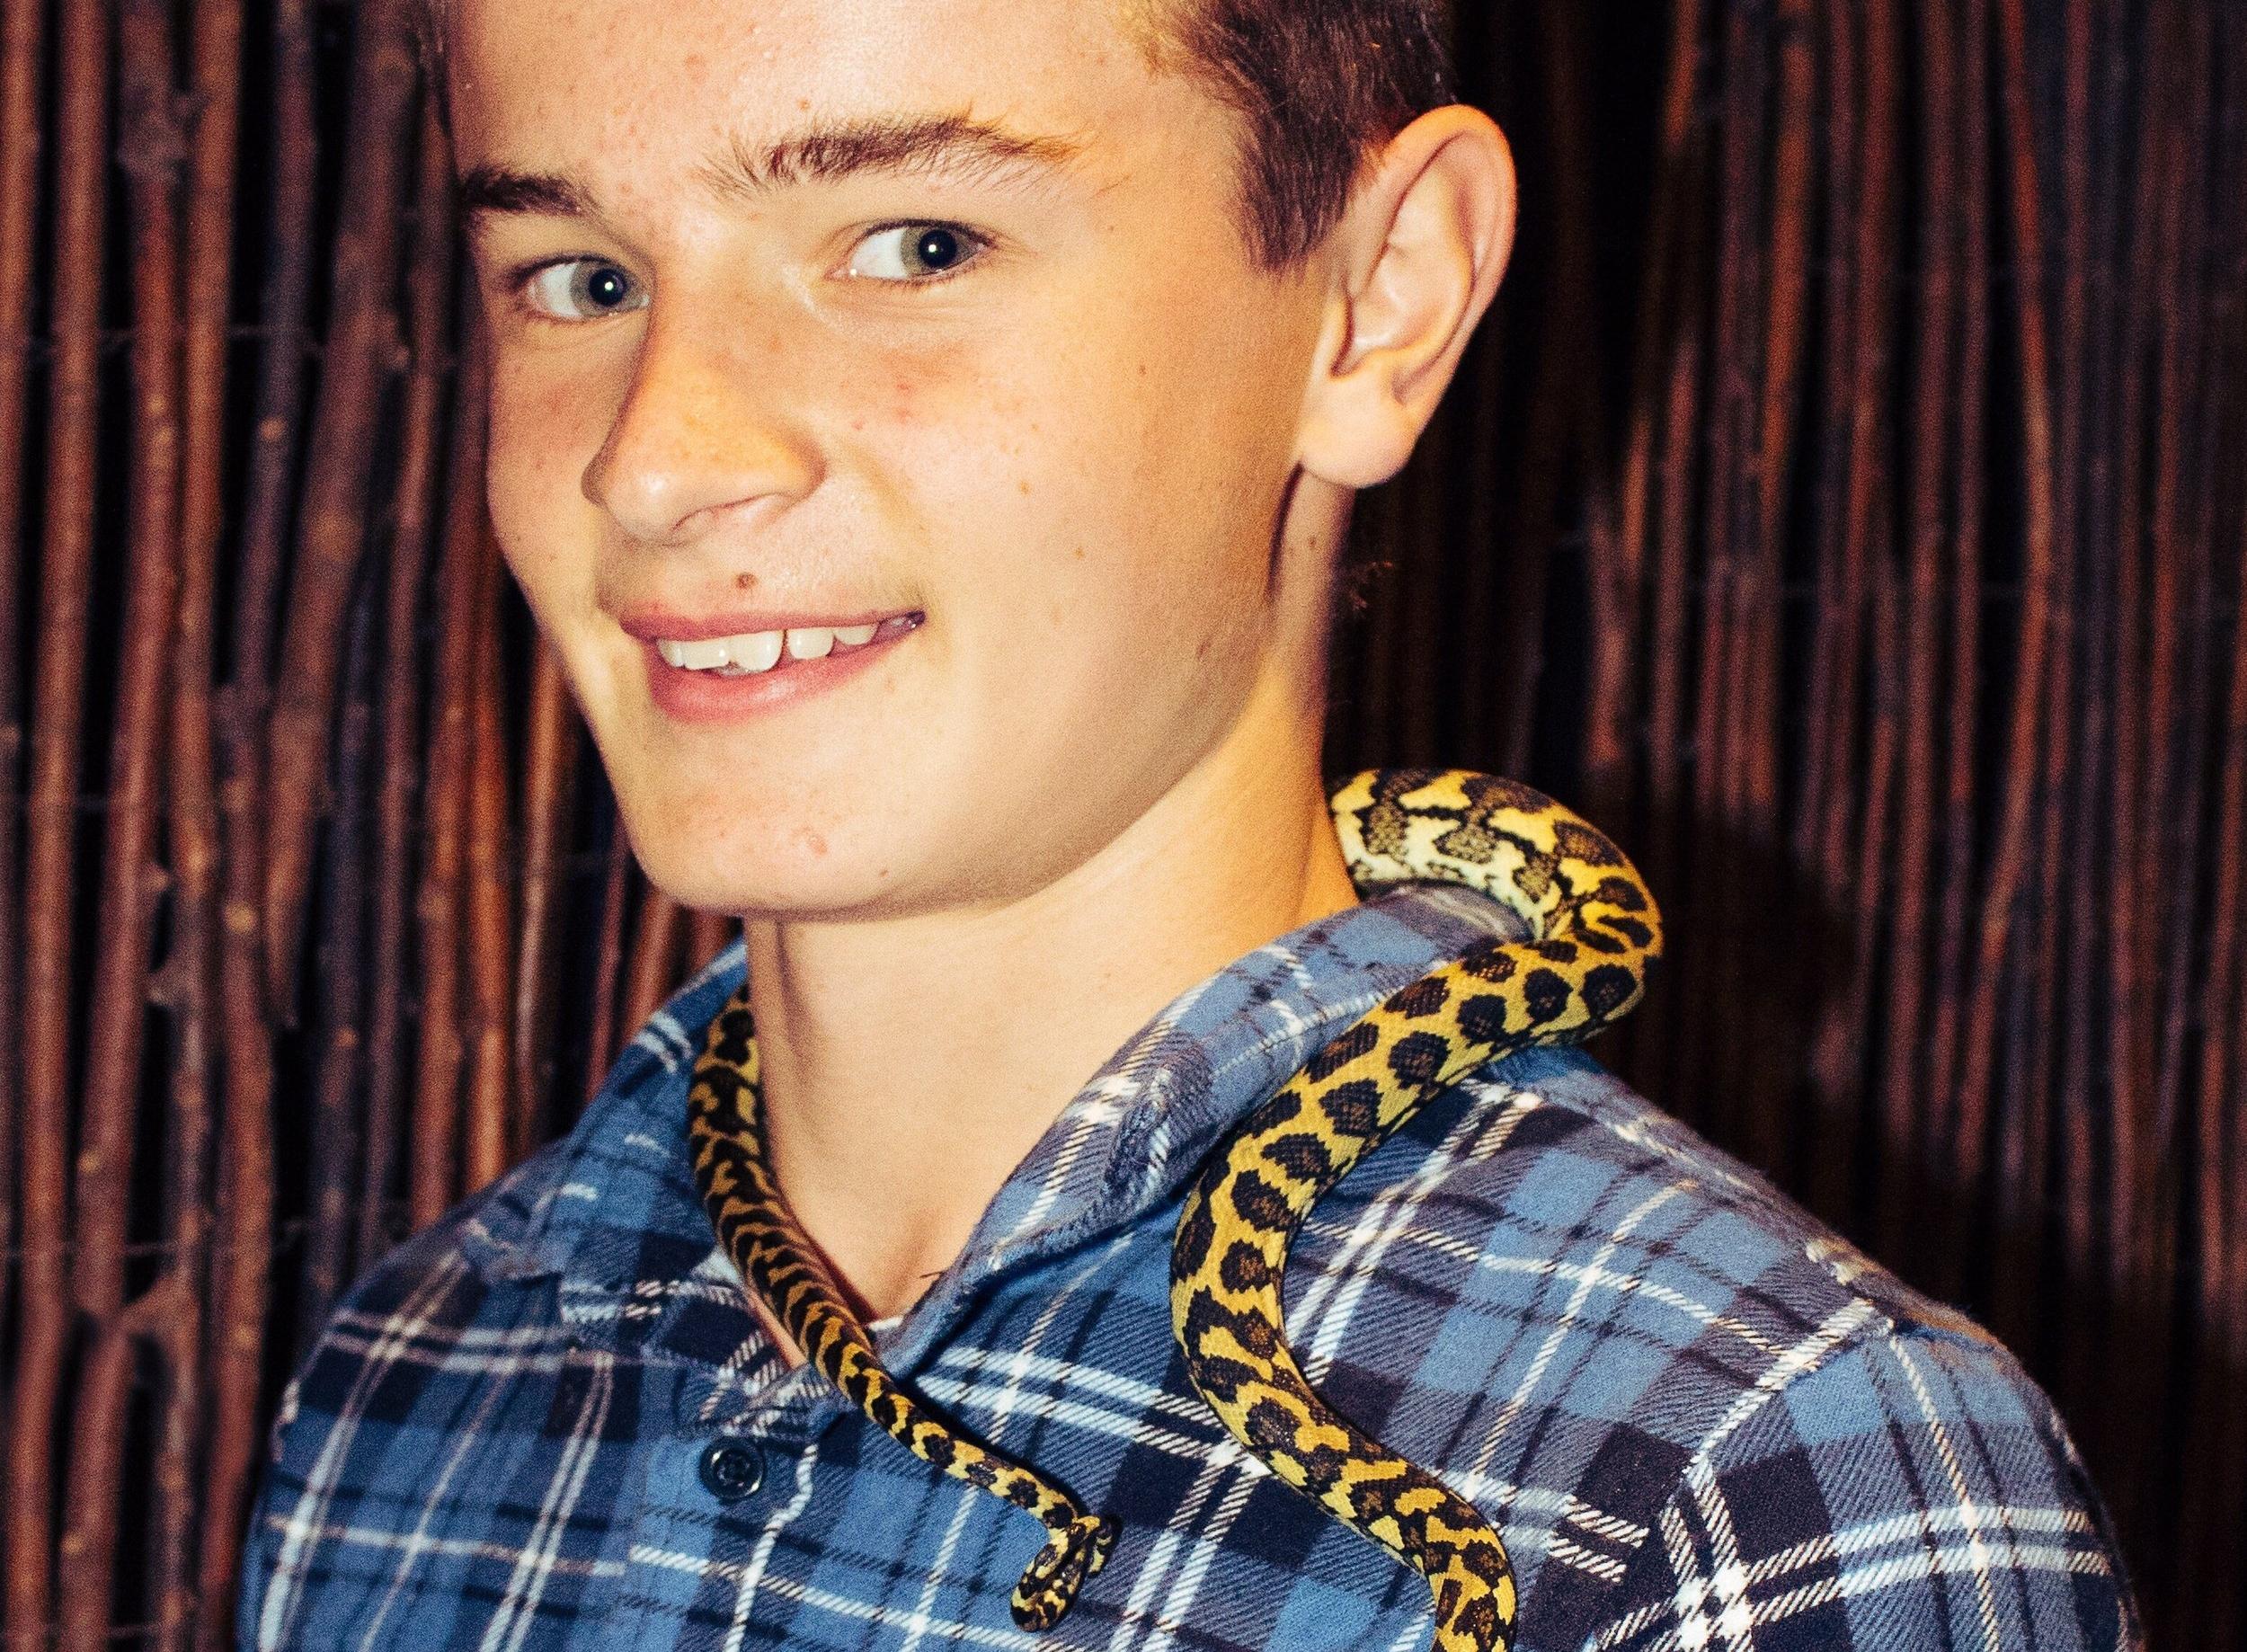 snake crop.jpg